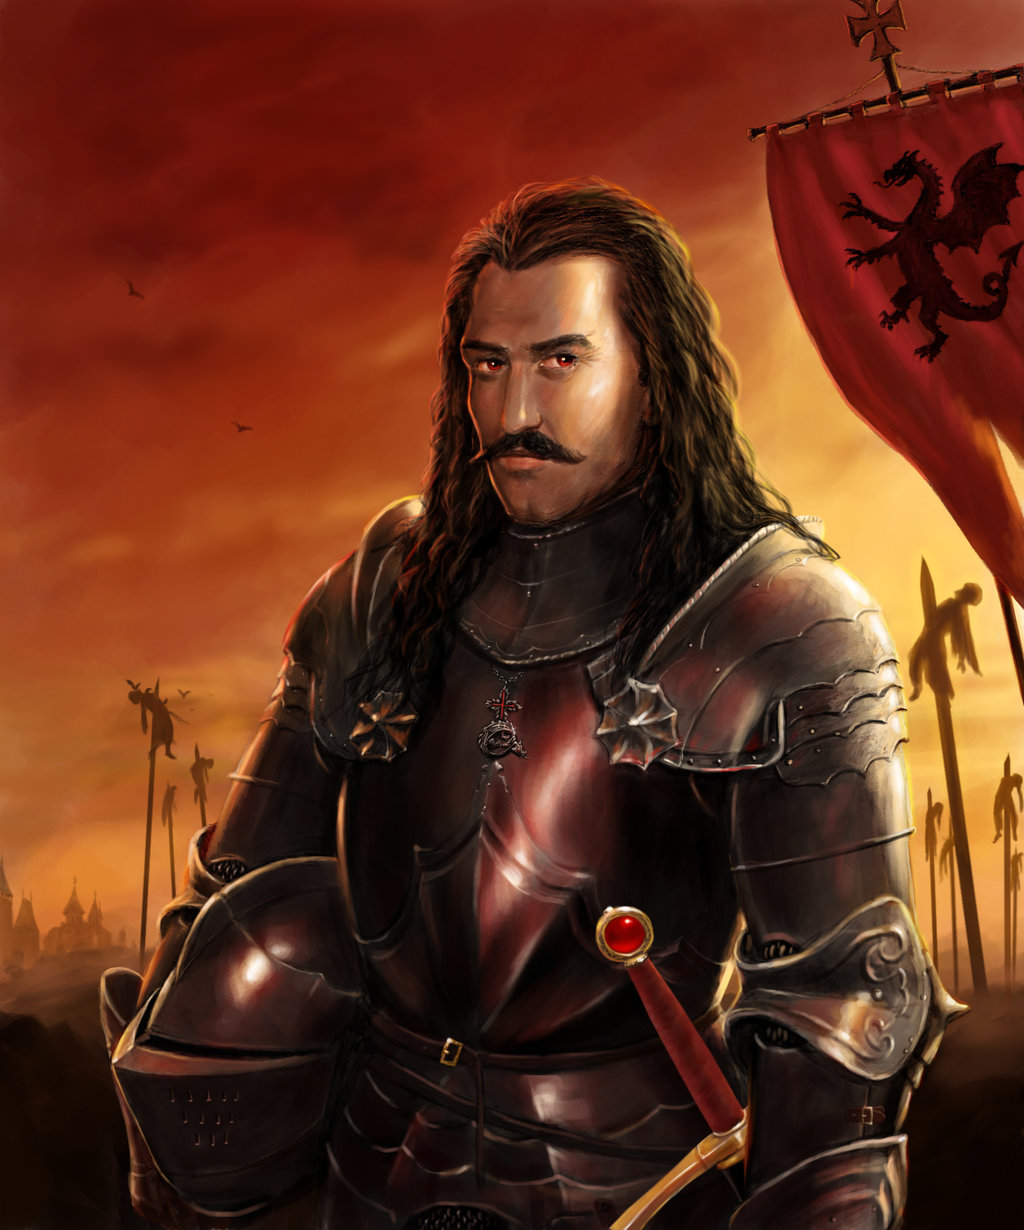 Vlad the Impaler Monster or Hero by dashinvaine 1024x1230